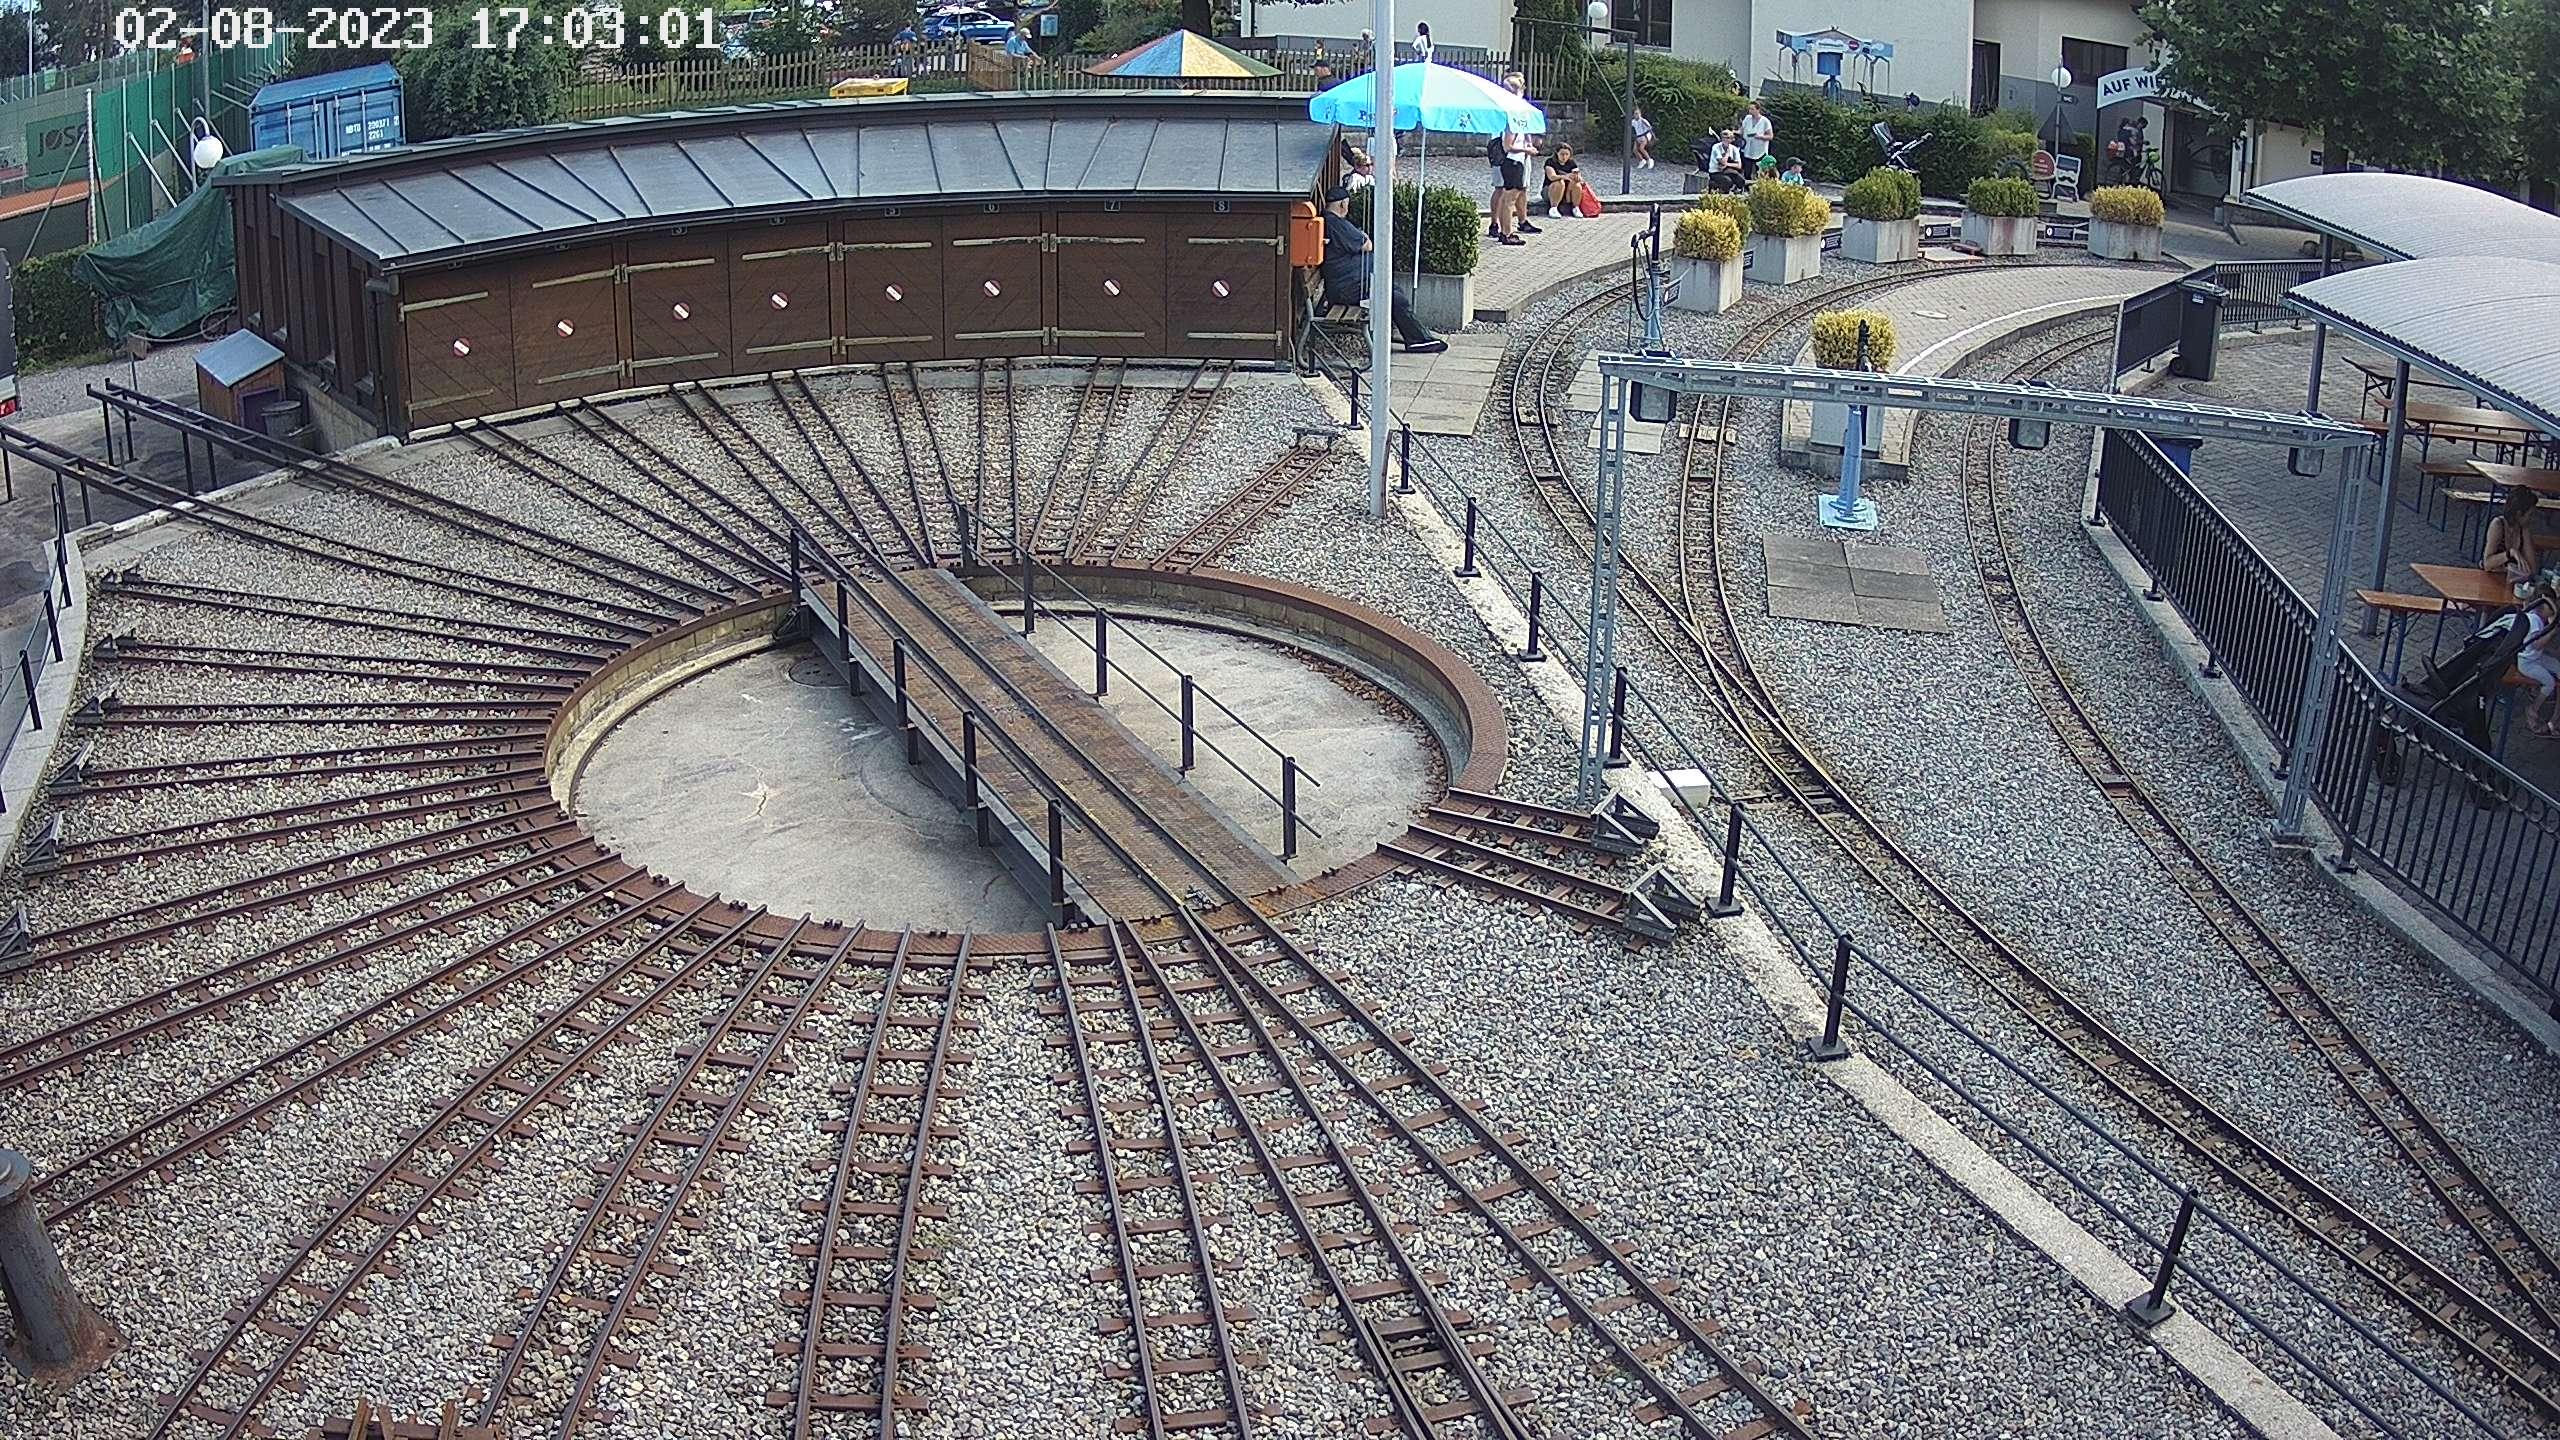 BahnhofVorneWebcam